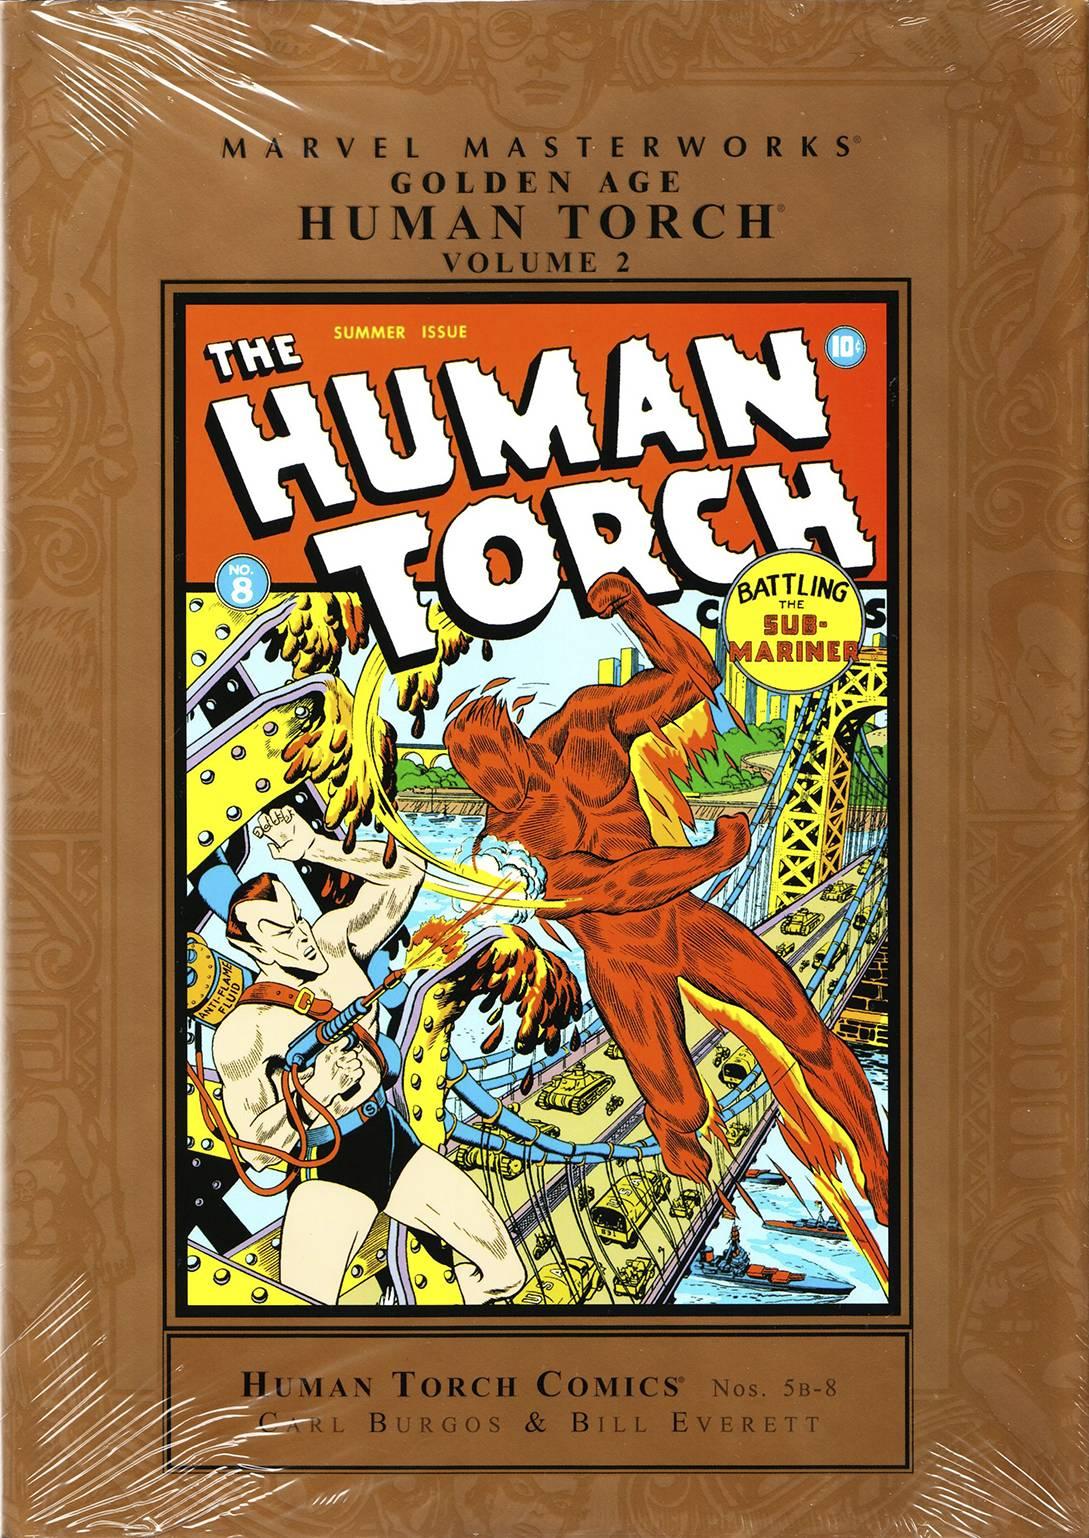 Marvel Masterworkds Golden Age Human Torch HC Vol. 2